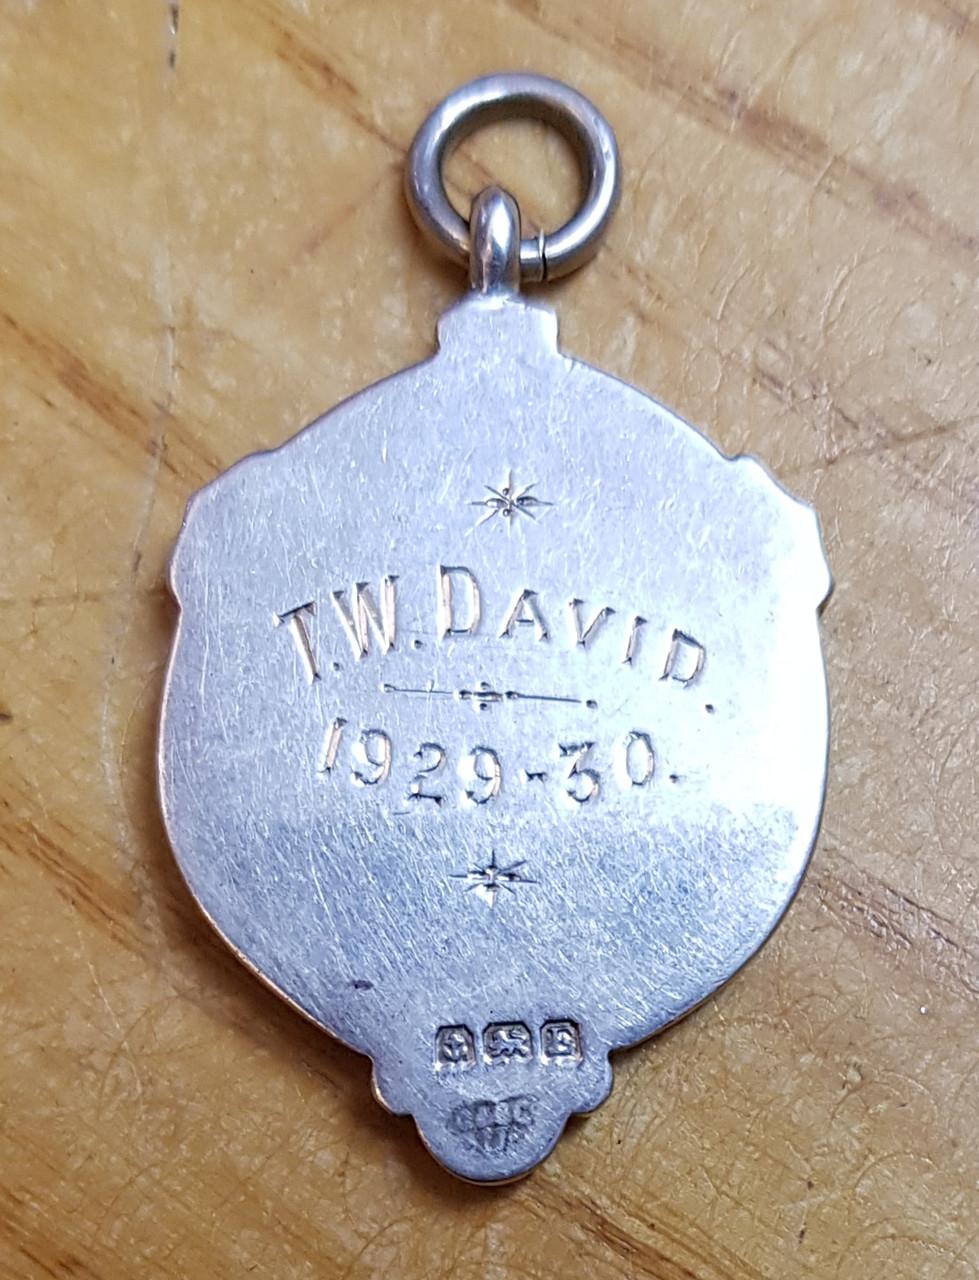 VT 0374. GREAT WESTERN RAILWAY SOLID SILVER 1929/30 FOOTBALL MEDAL